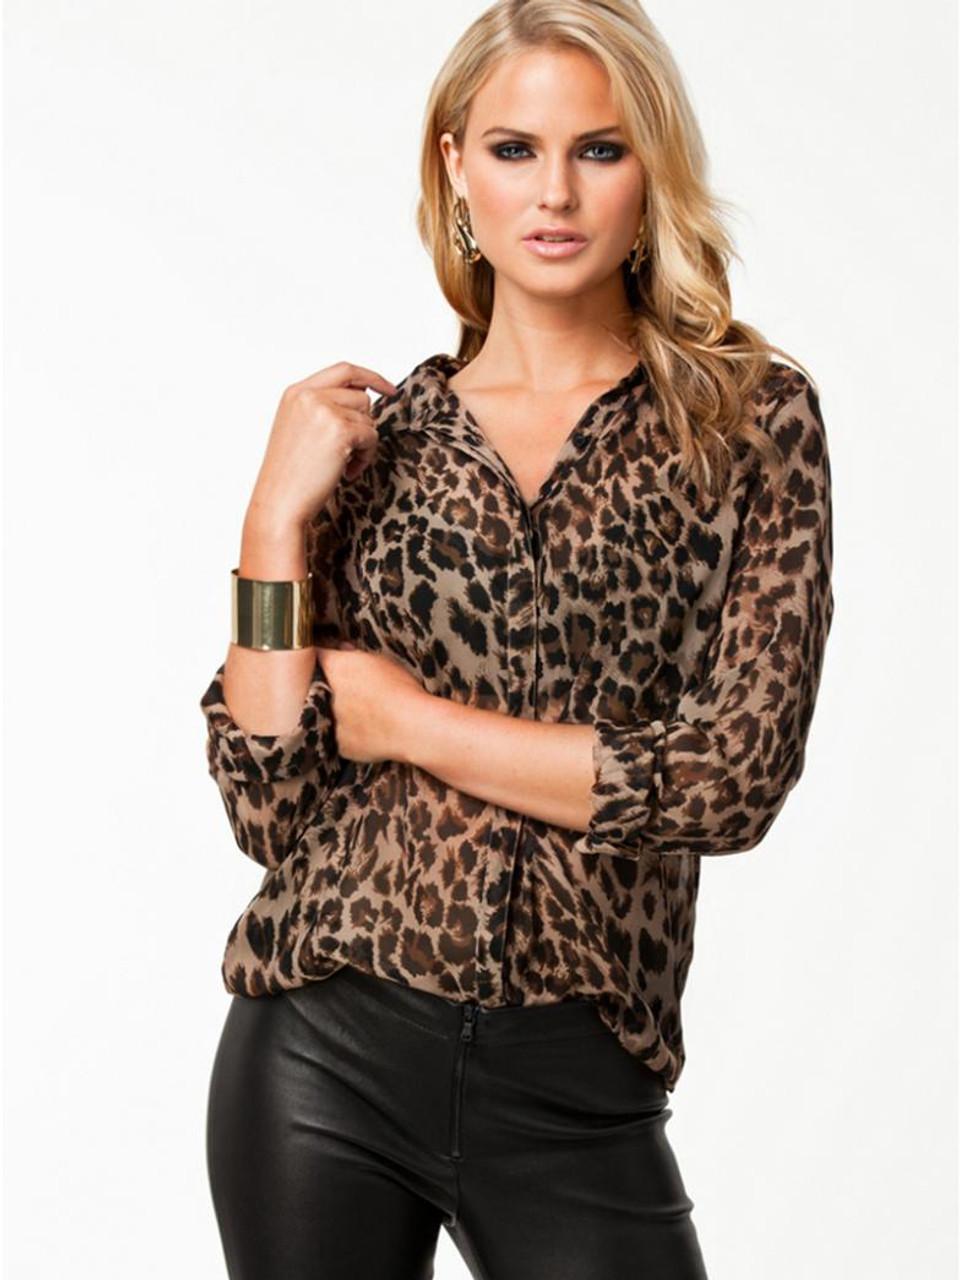 d45734b6 New-Style-Women-Wild-Leopard-Print-Blouse-Lady-Sexy-Long-Sleeve -Tops-Loose-V-Neck-Leopard__17368.1556853265.jpg?c=2&imbypass=on